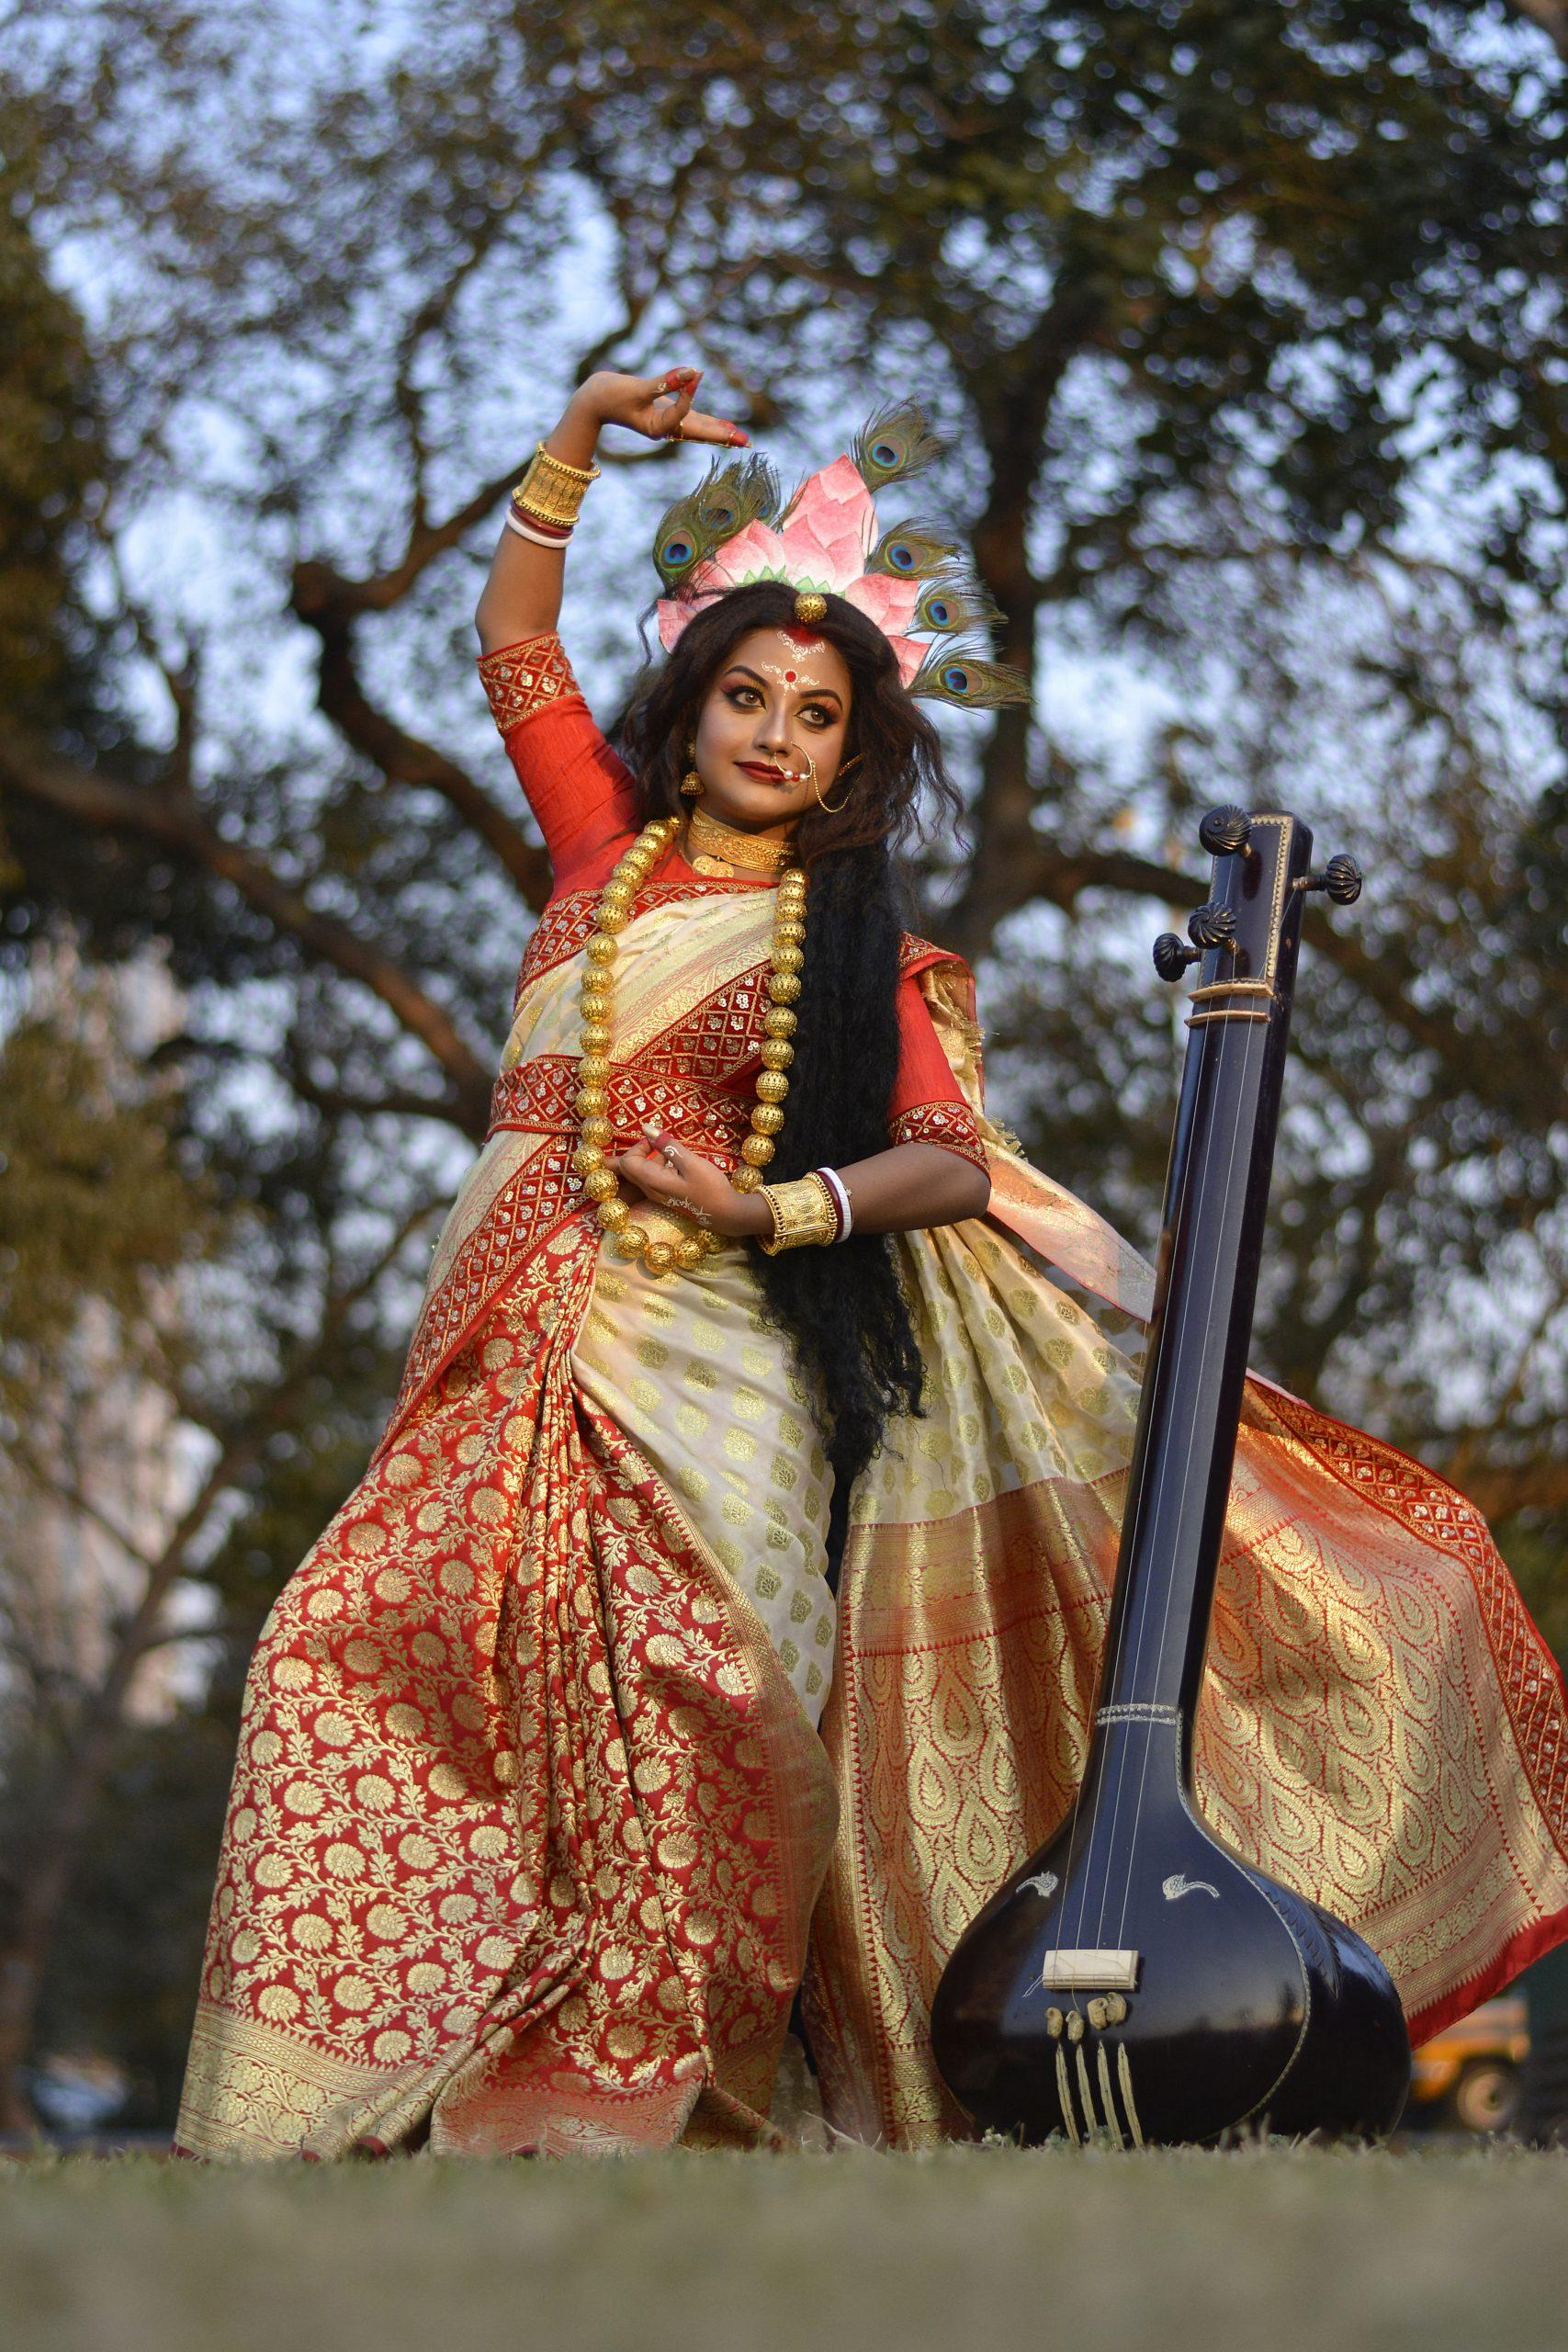 Goddess Sarasvati posture done by a woman